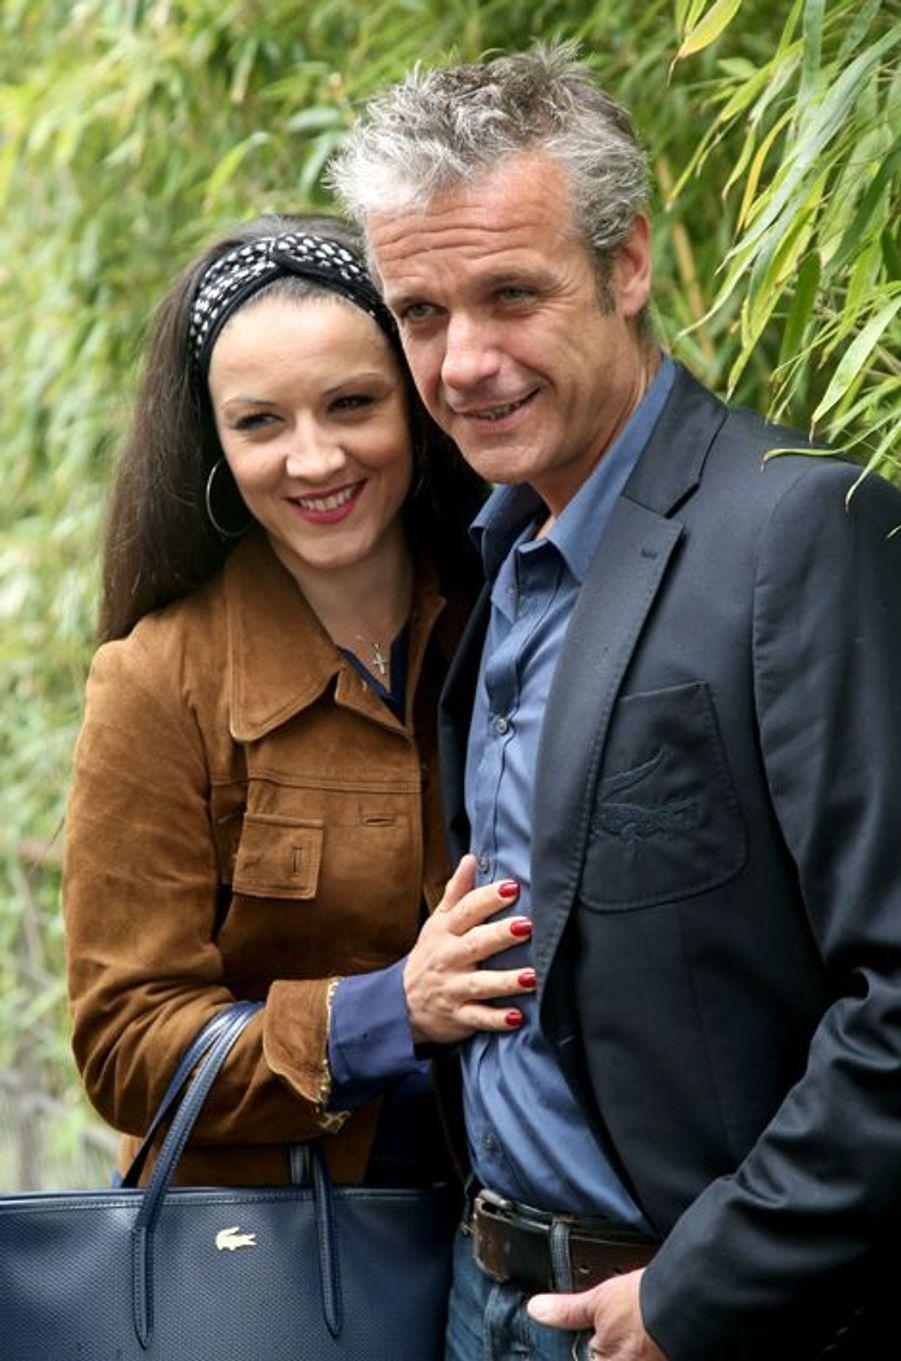 David Brecourt et sa compagne Sarra Mona